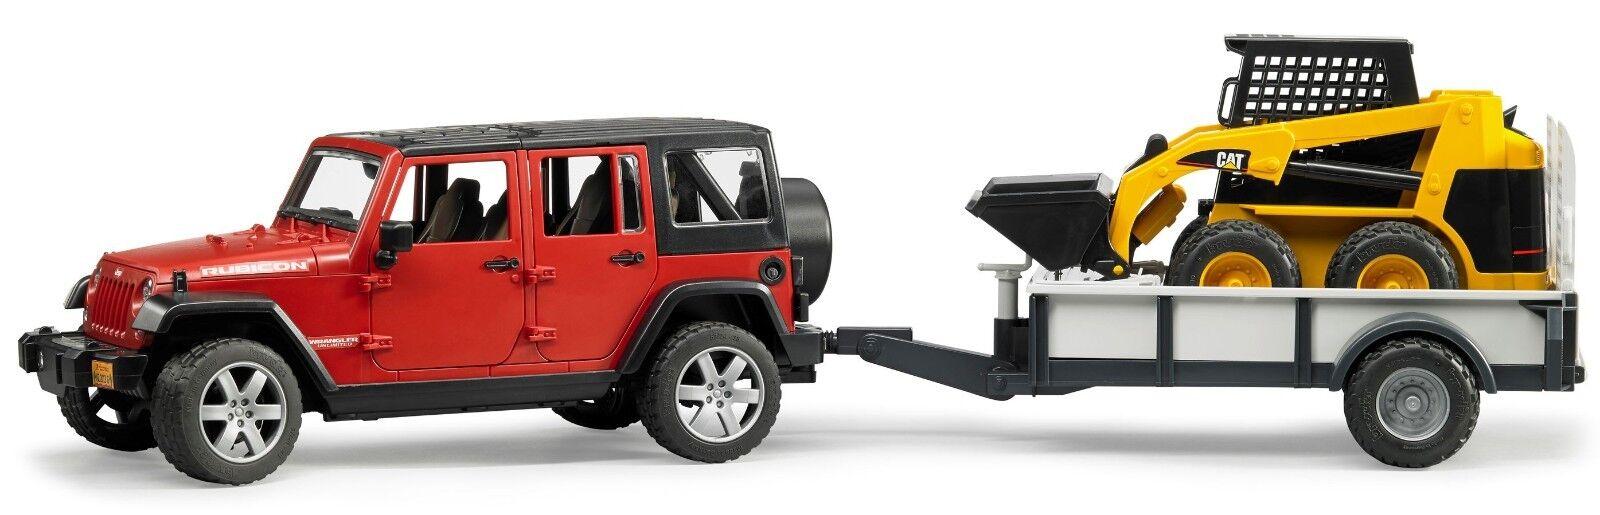 Bruder Toys JEEP Wrangler Unlimited Rubicon w  Trailer & CAT skid steer loader